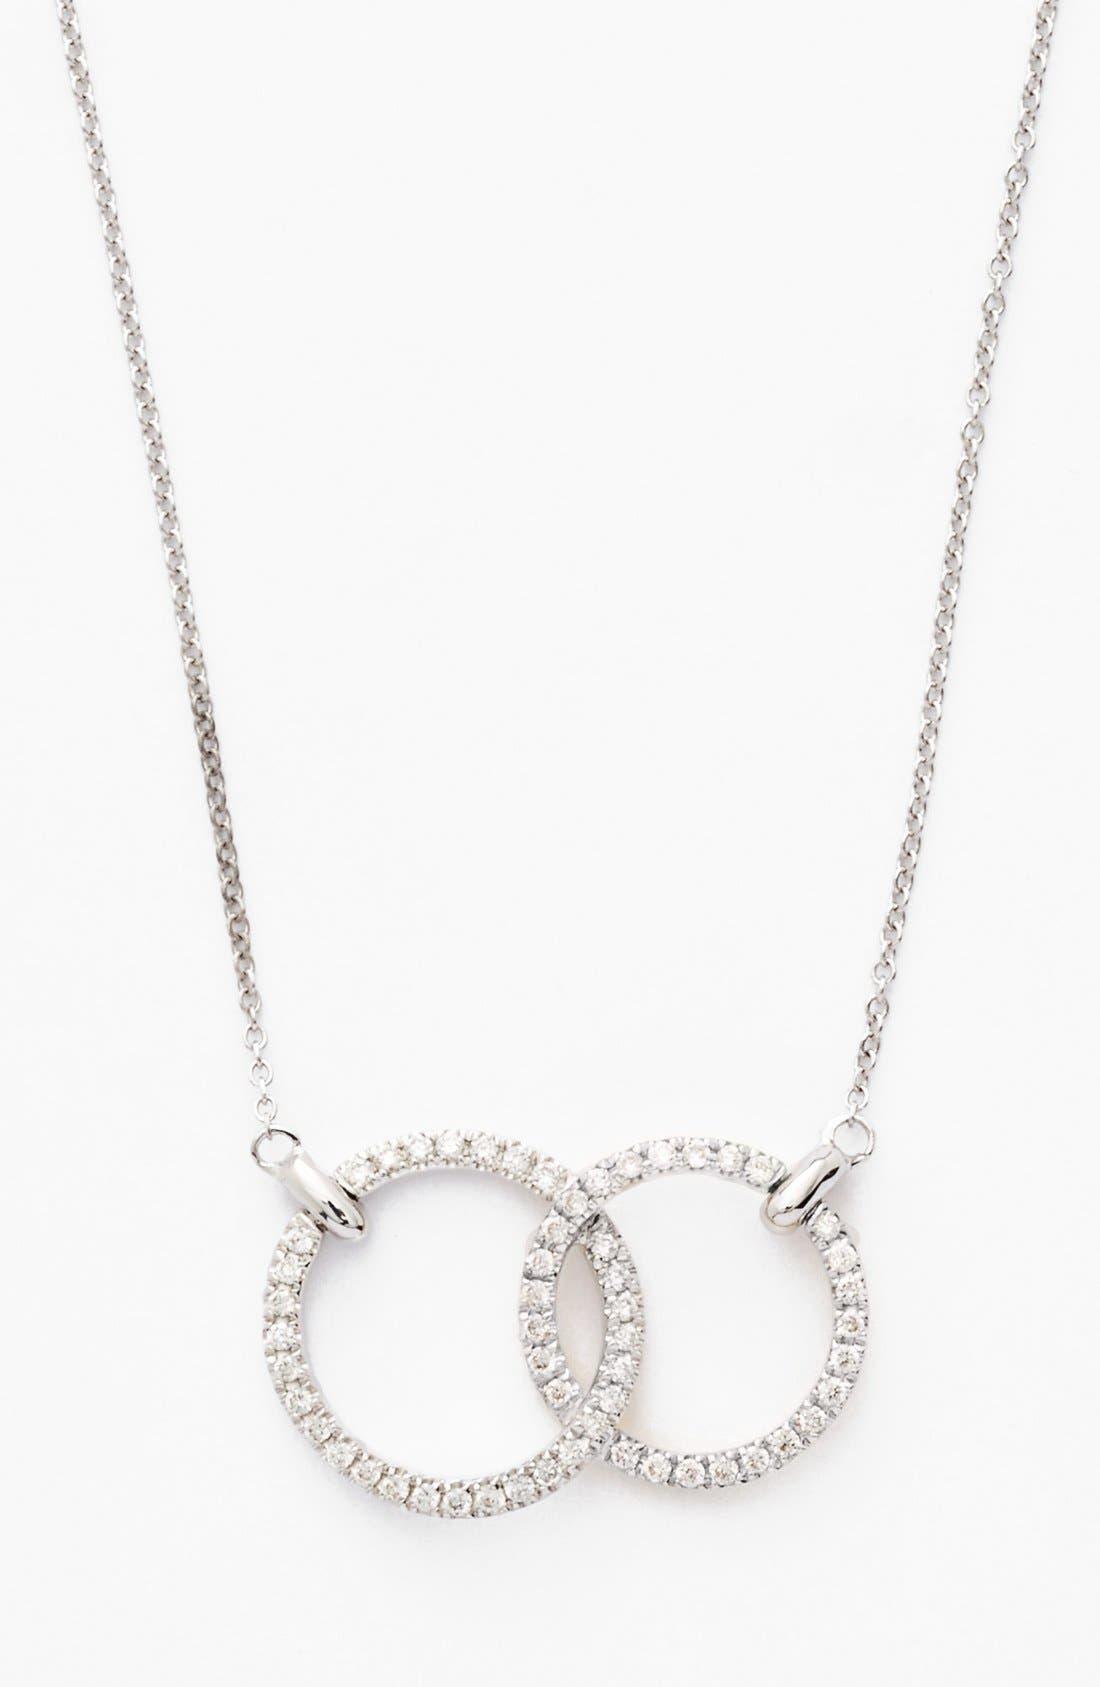 Double Diamond Circle Pendant Necklace,                             Main thumbnail 1, color,                             WHITE GOLD